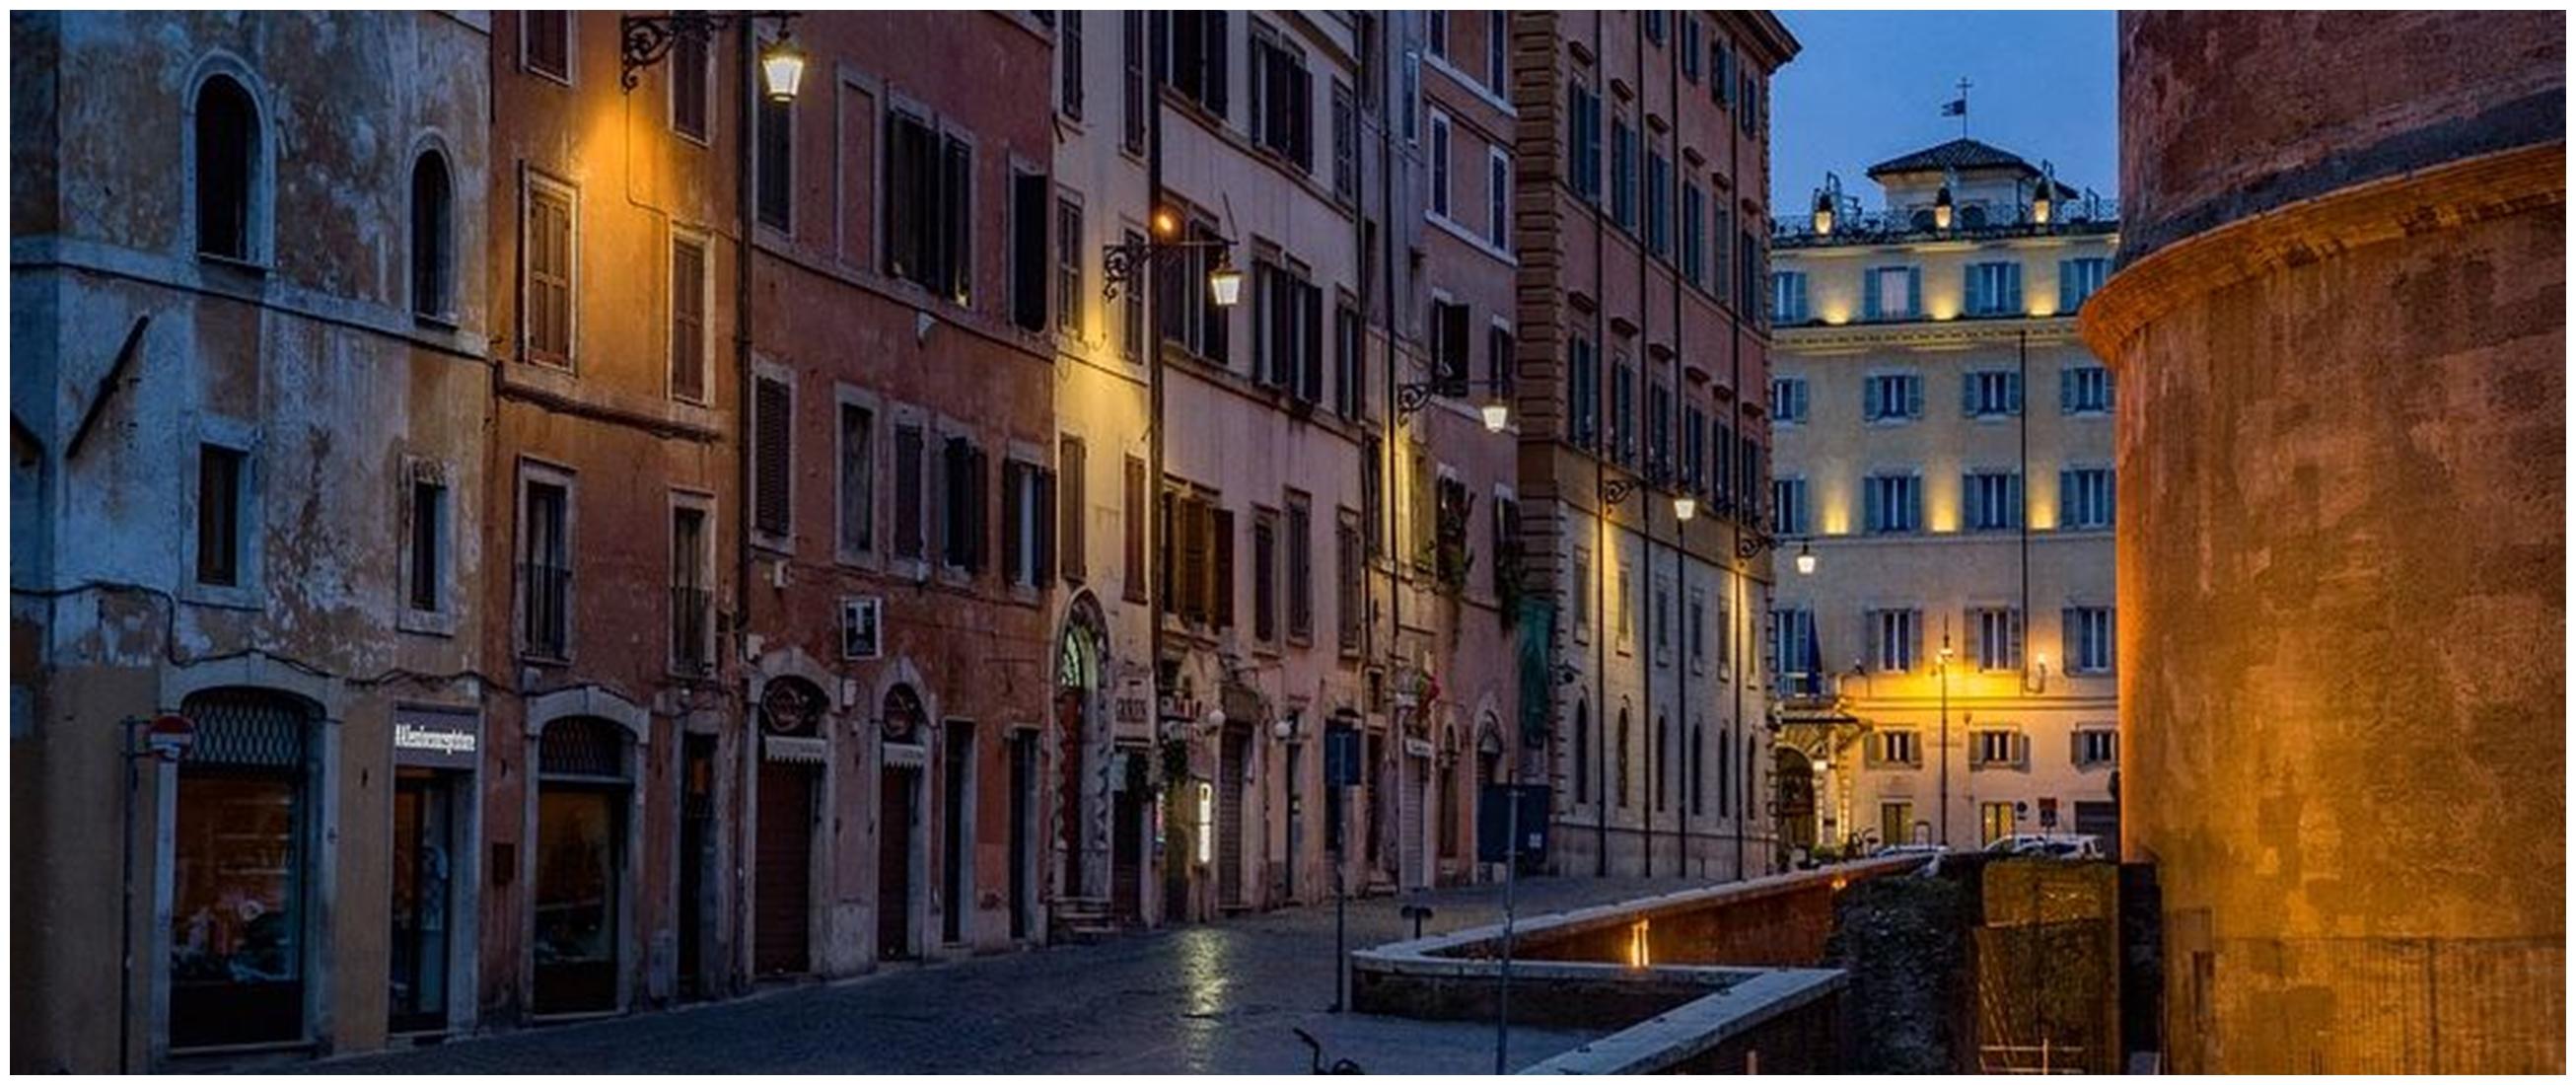 Kematian pasien corona di Italia tertinggi di dunia, ini penjelasannya